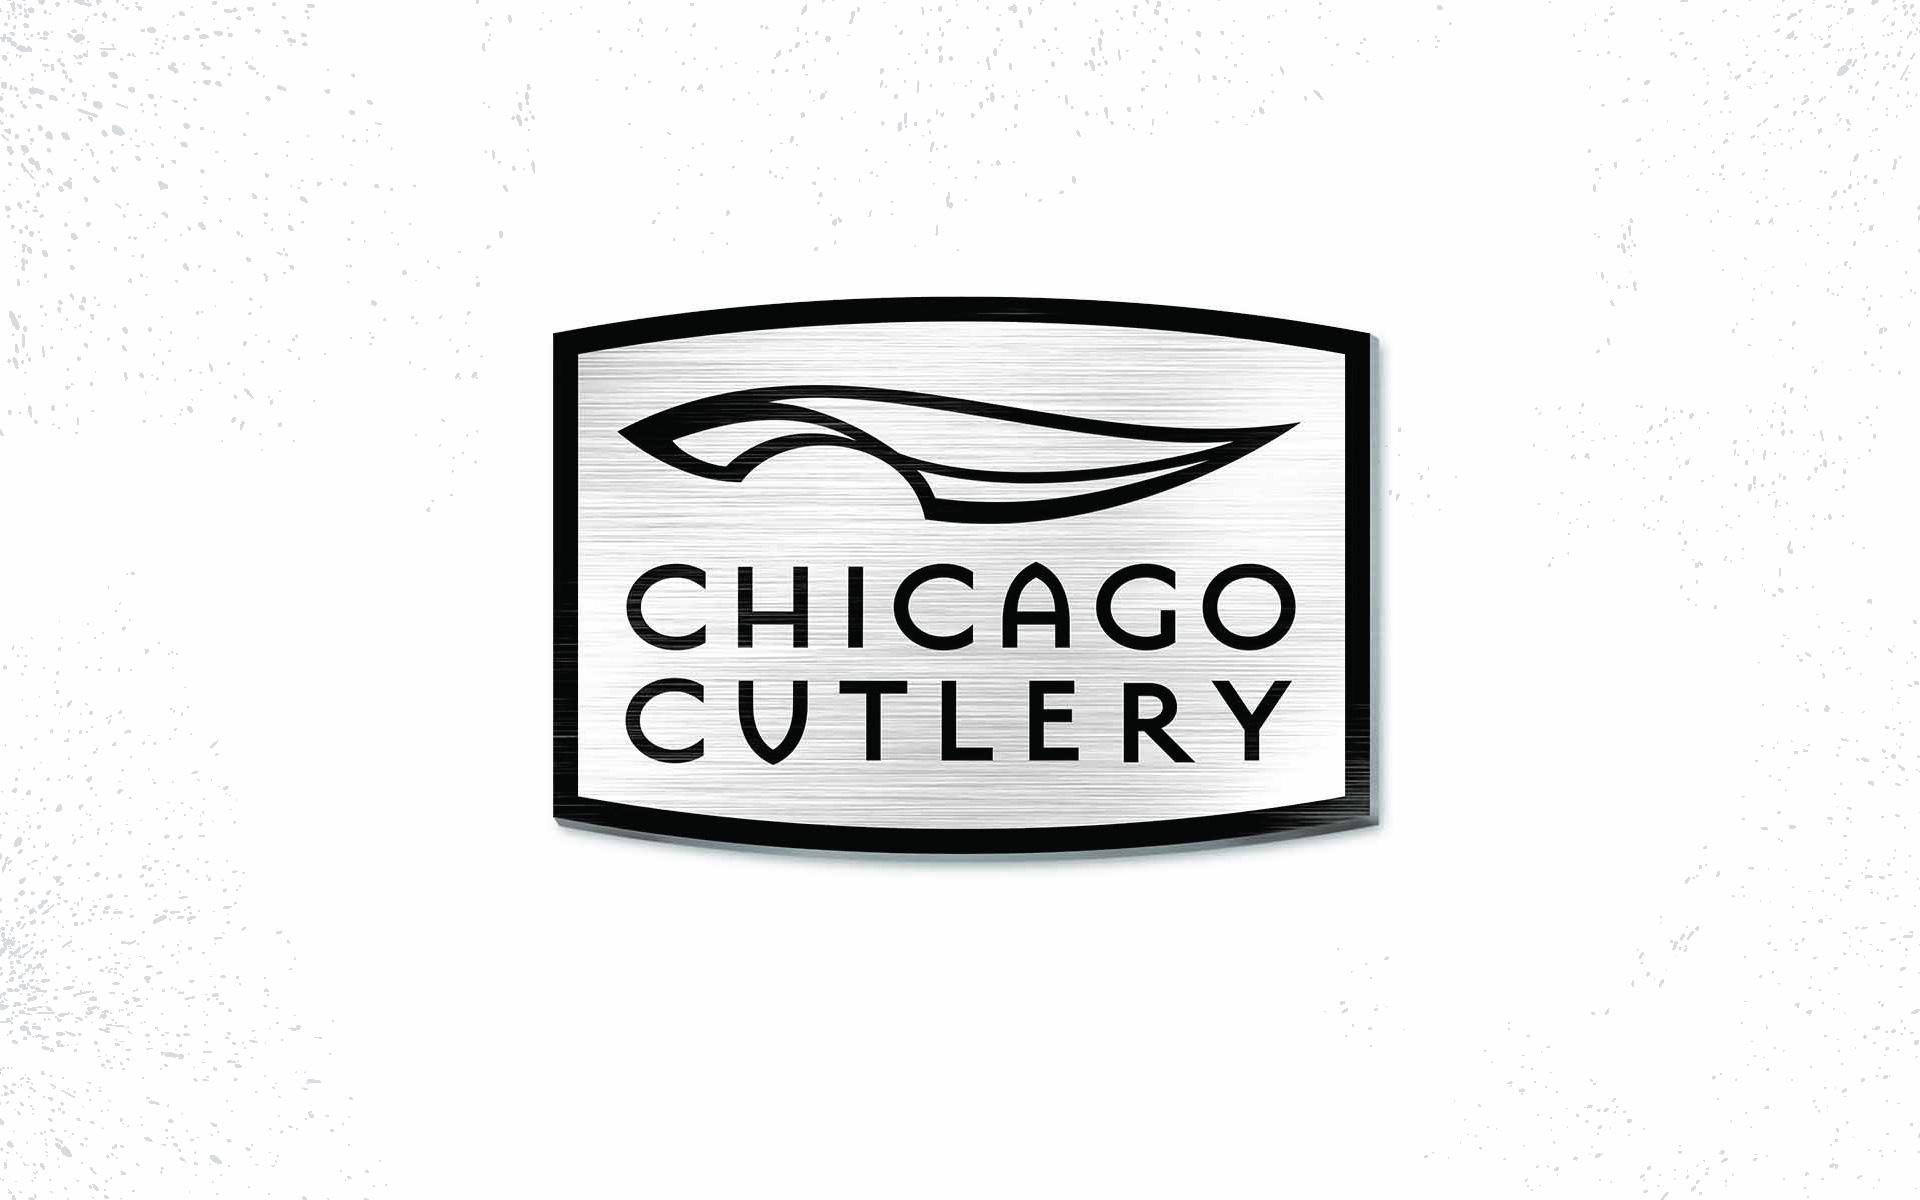 Chicago Cutlery - Brand Identity